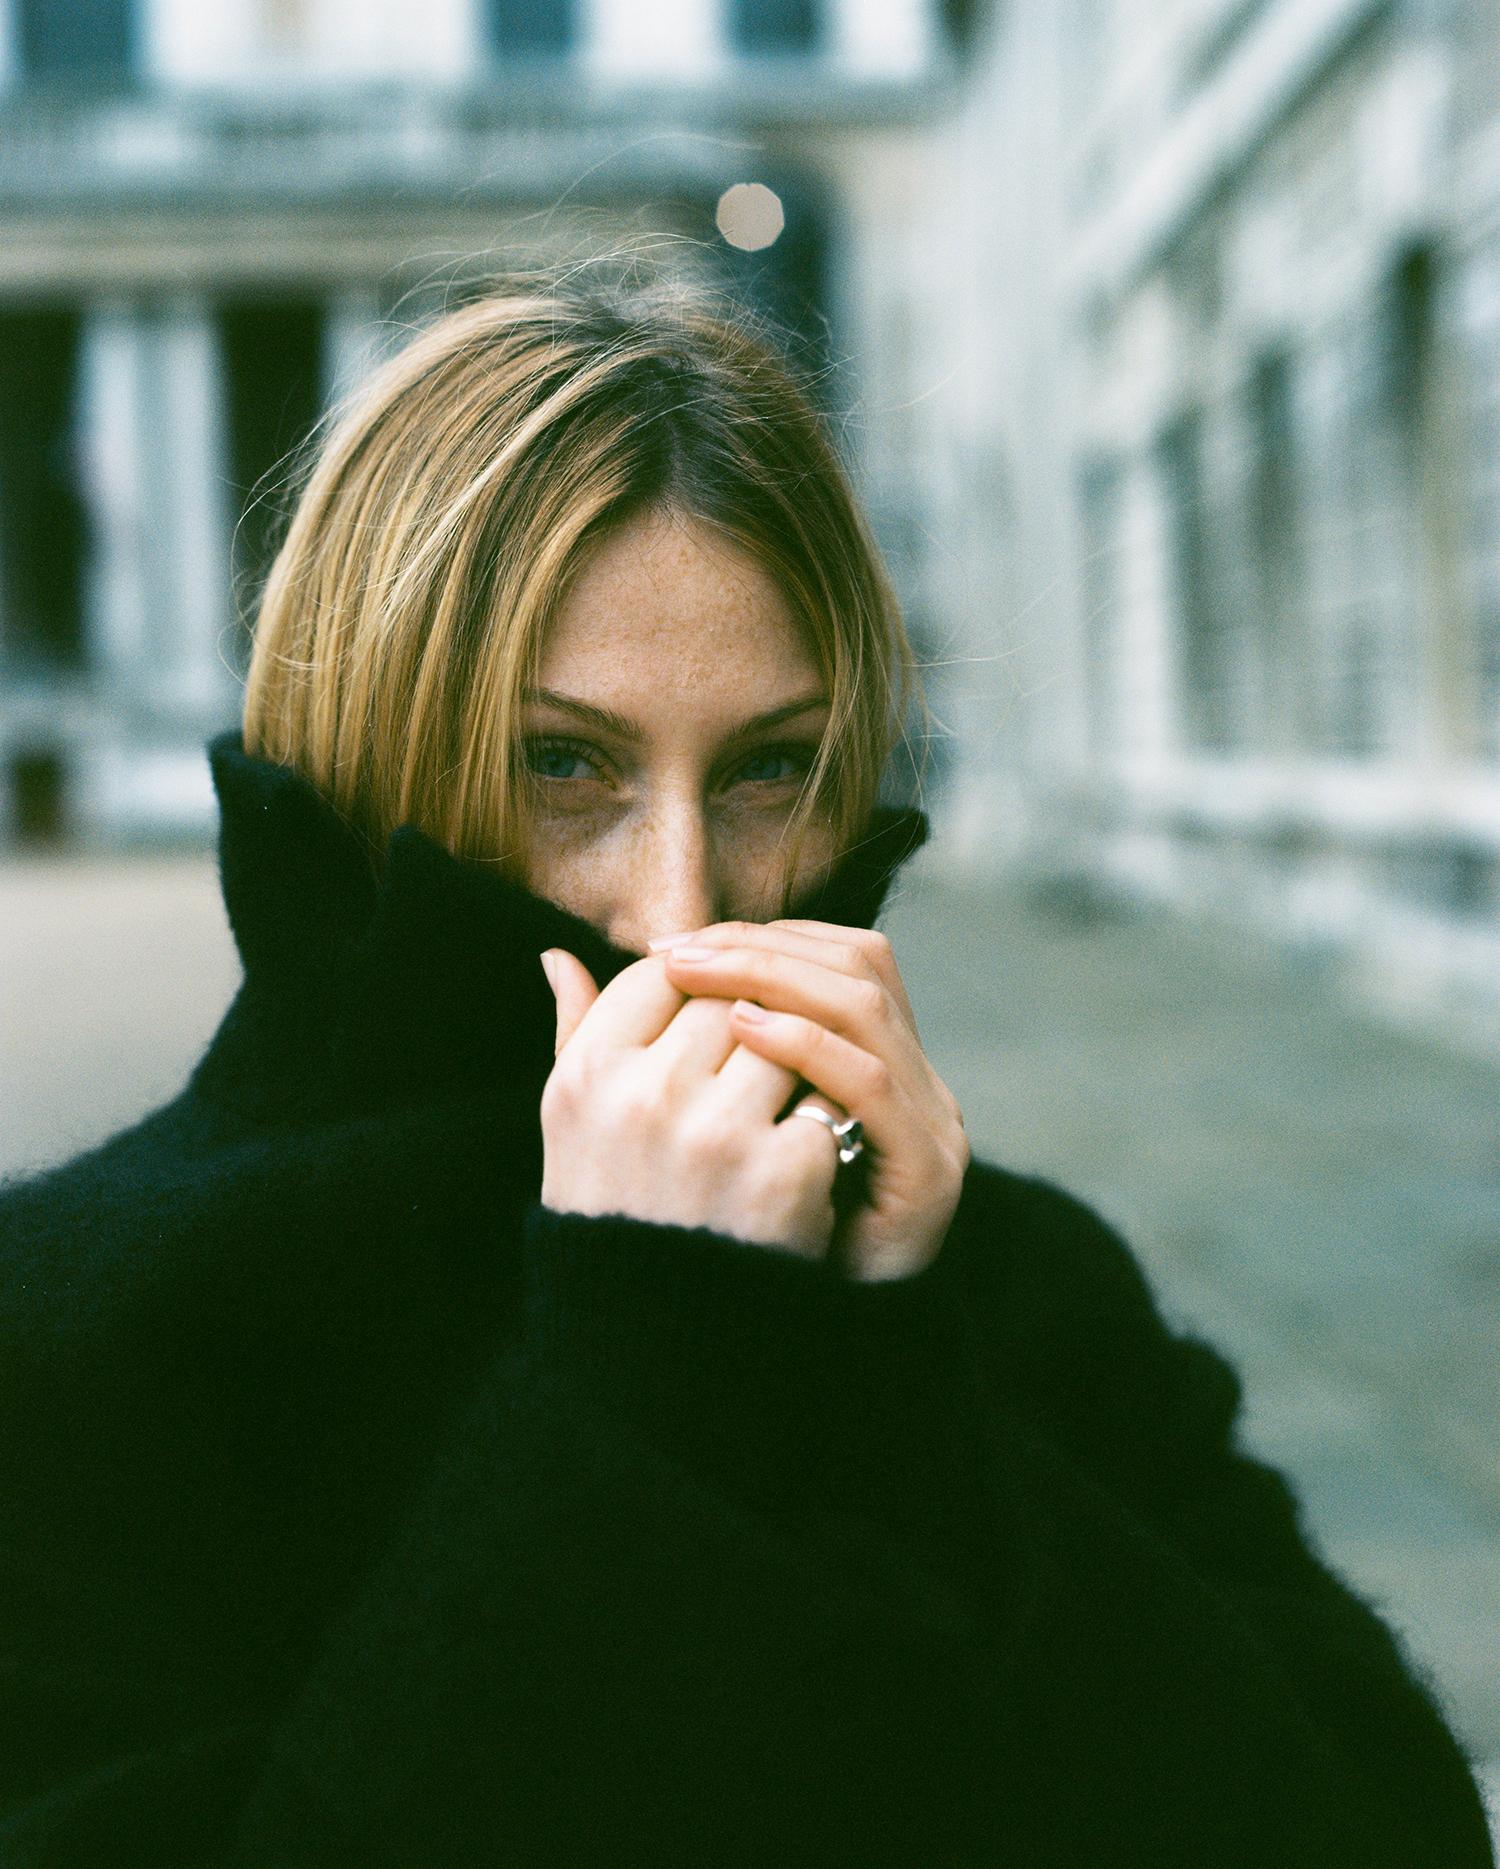 Dmitry Serostanov. Portrait and editorial photographer in London.